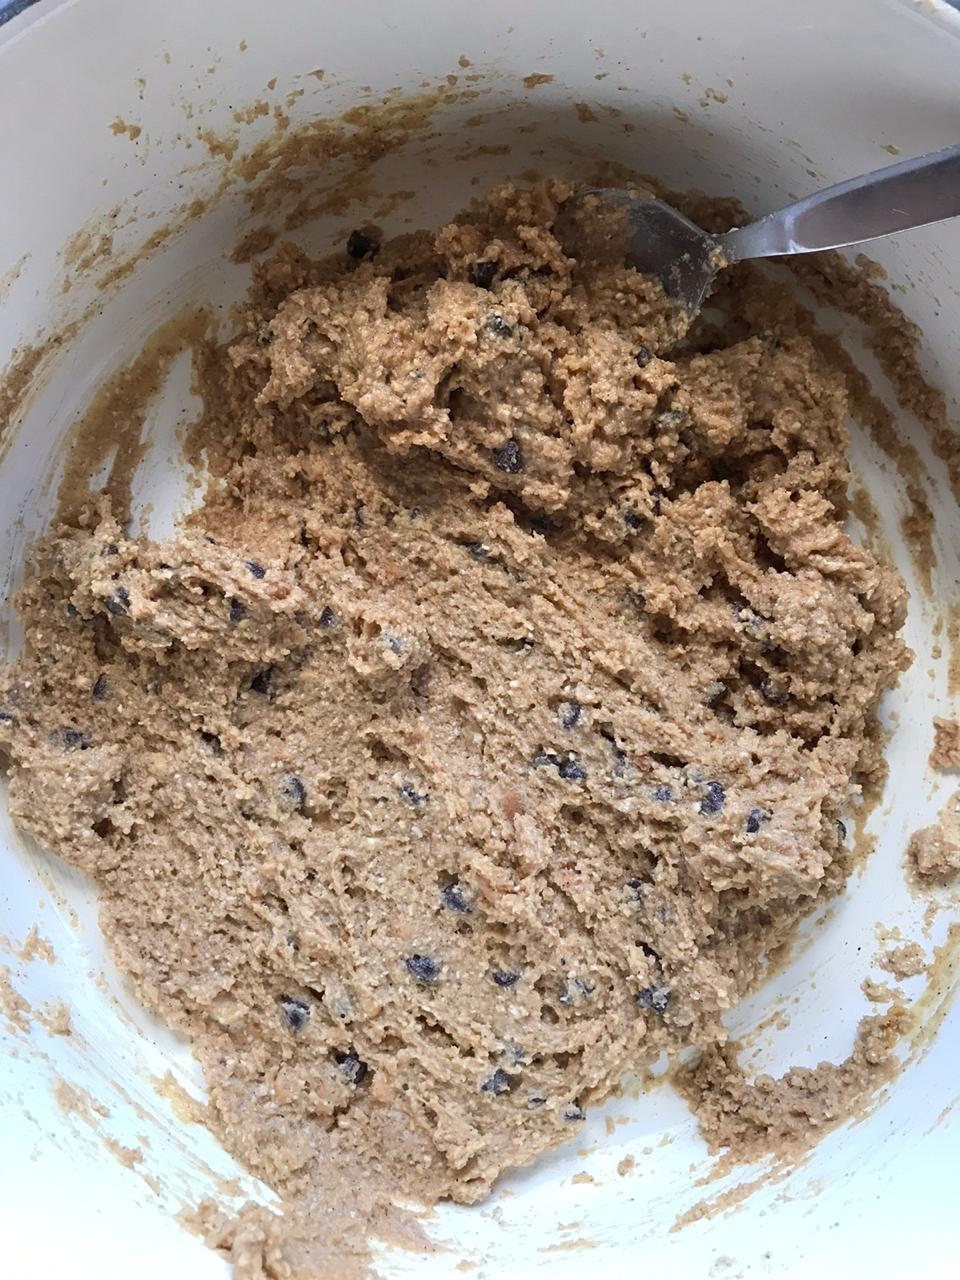 Mixing healthy cookie cereal ingredients